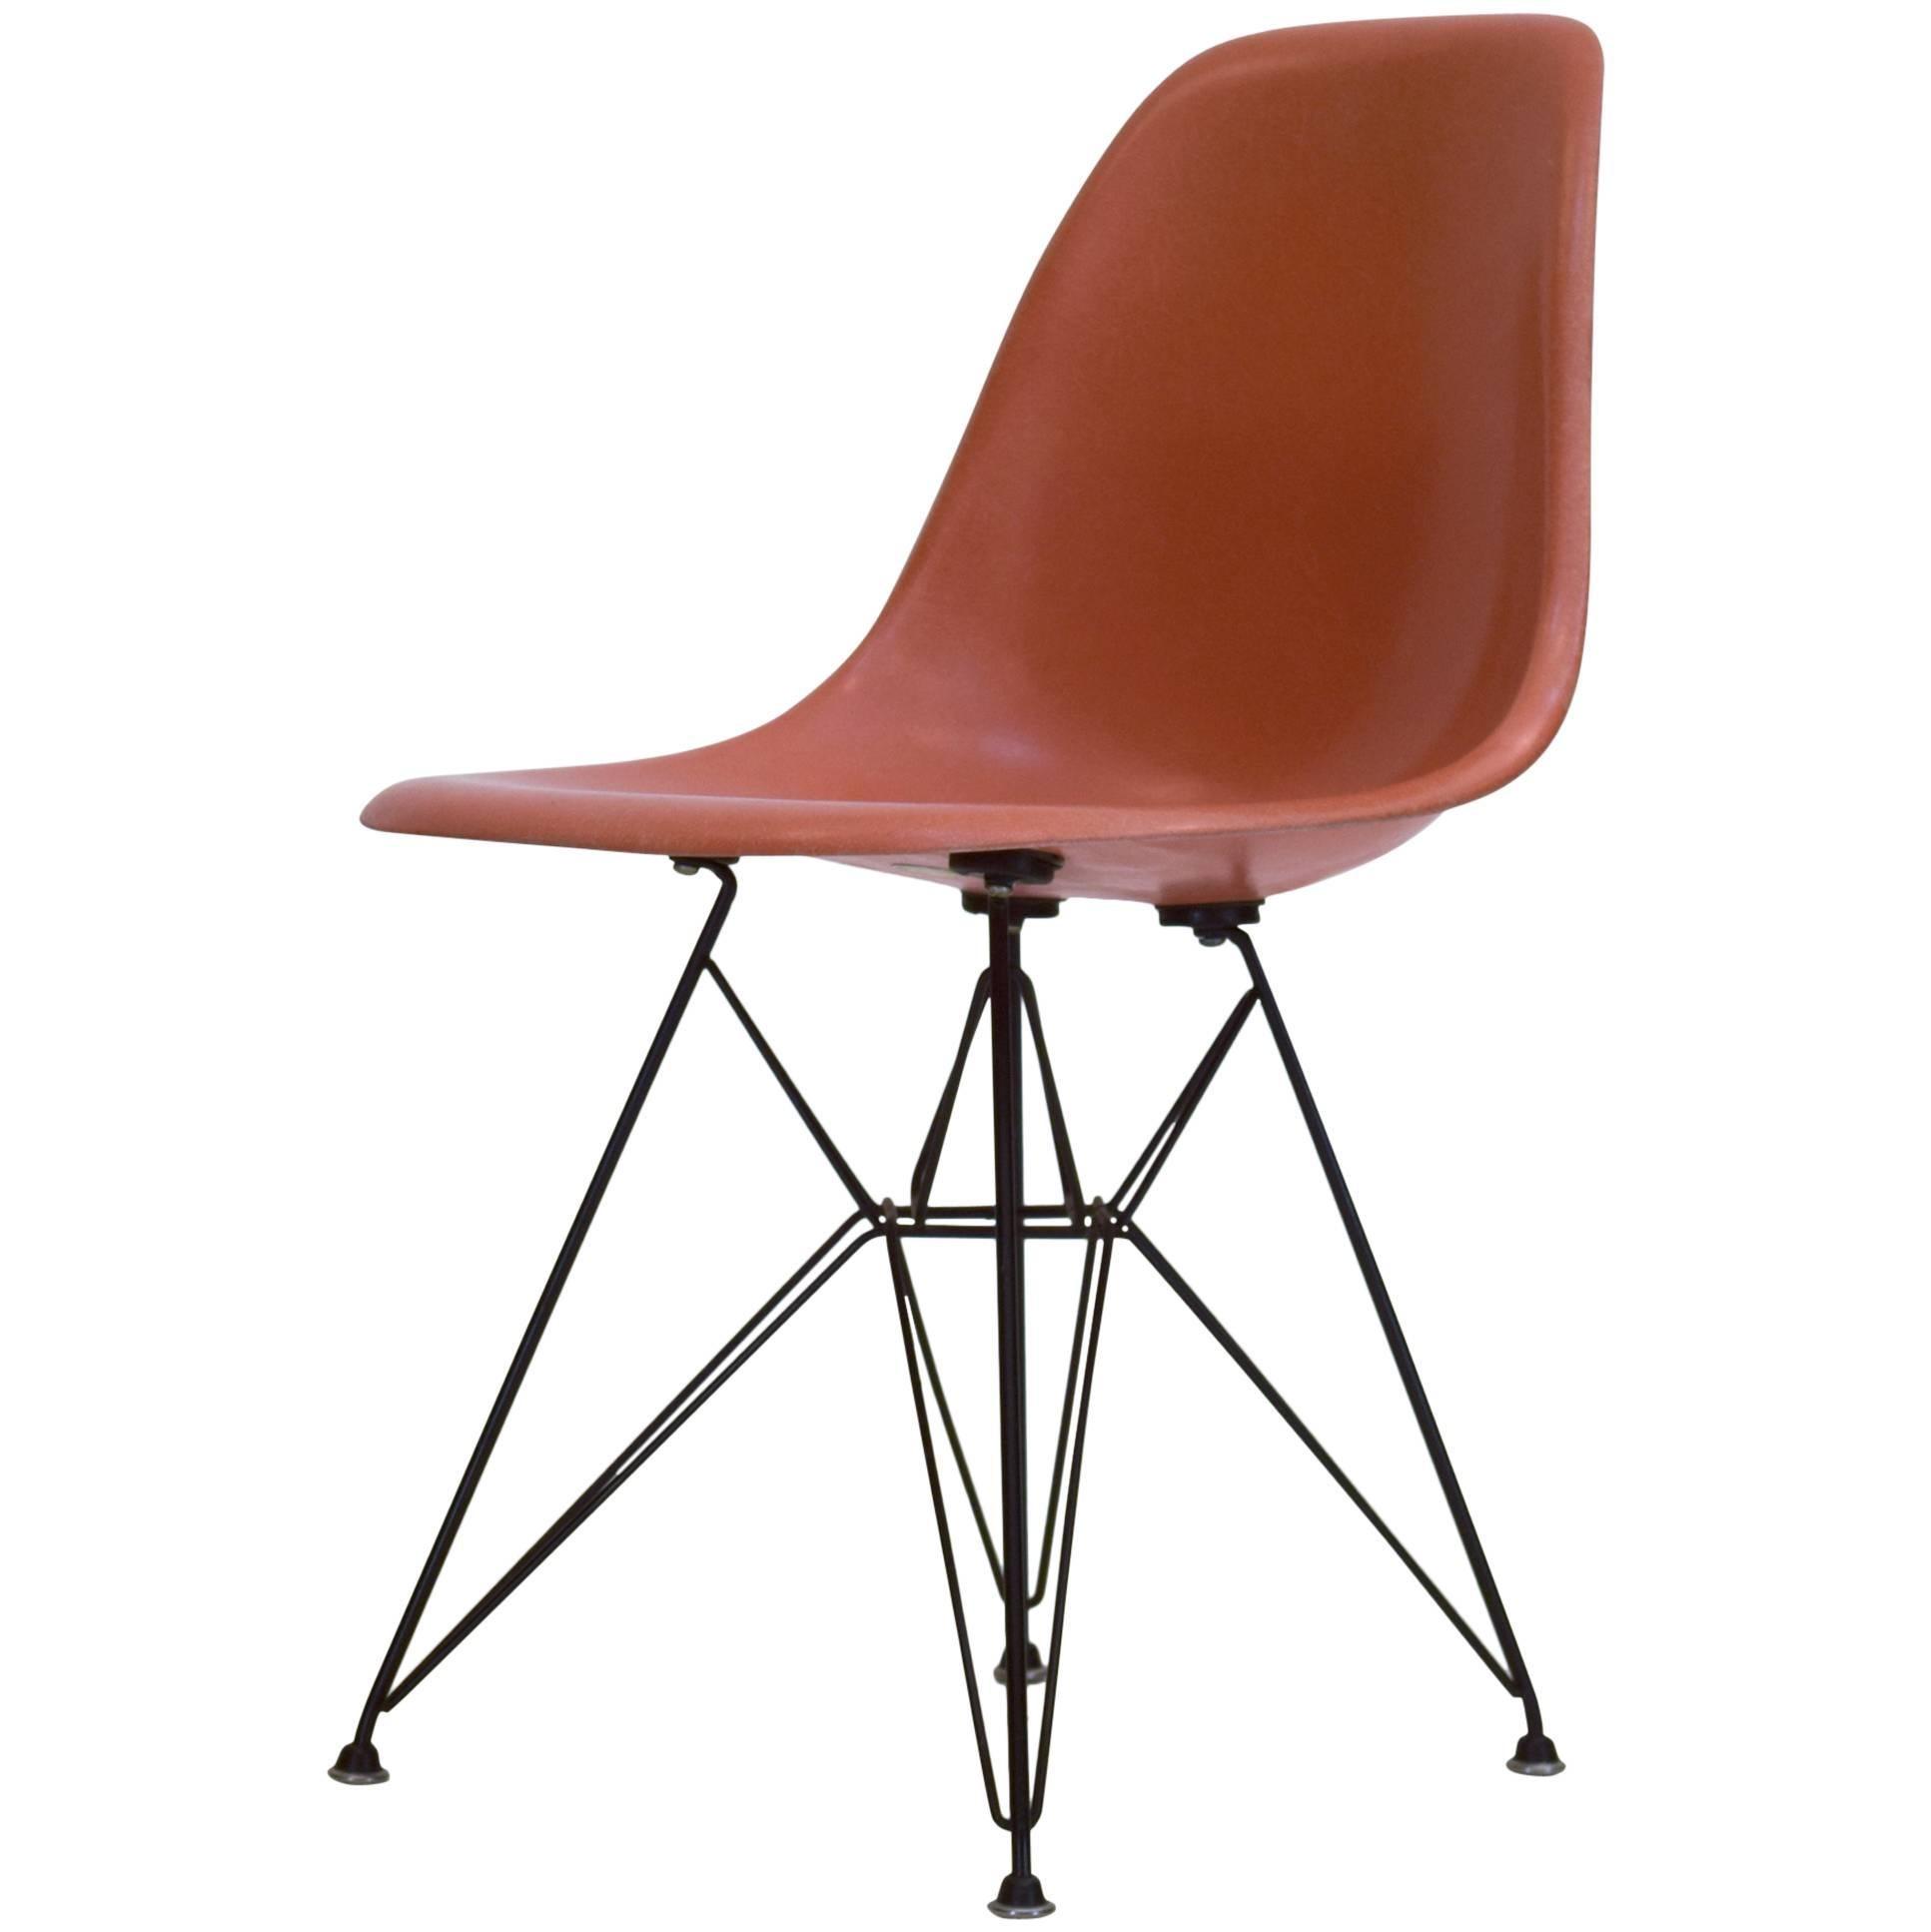 Eames Shell Chair on Original Eiffel Base, 1950s